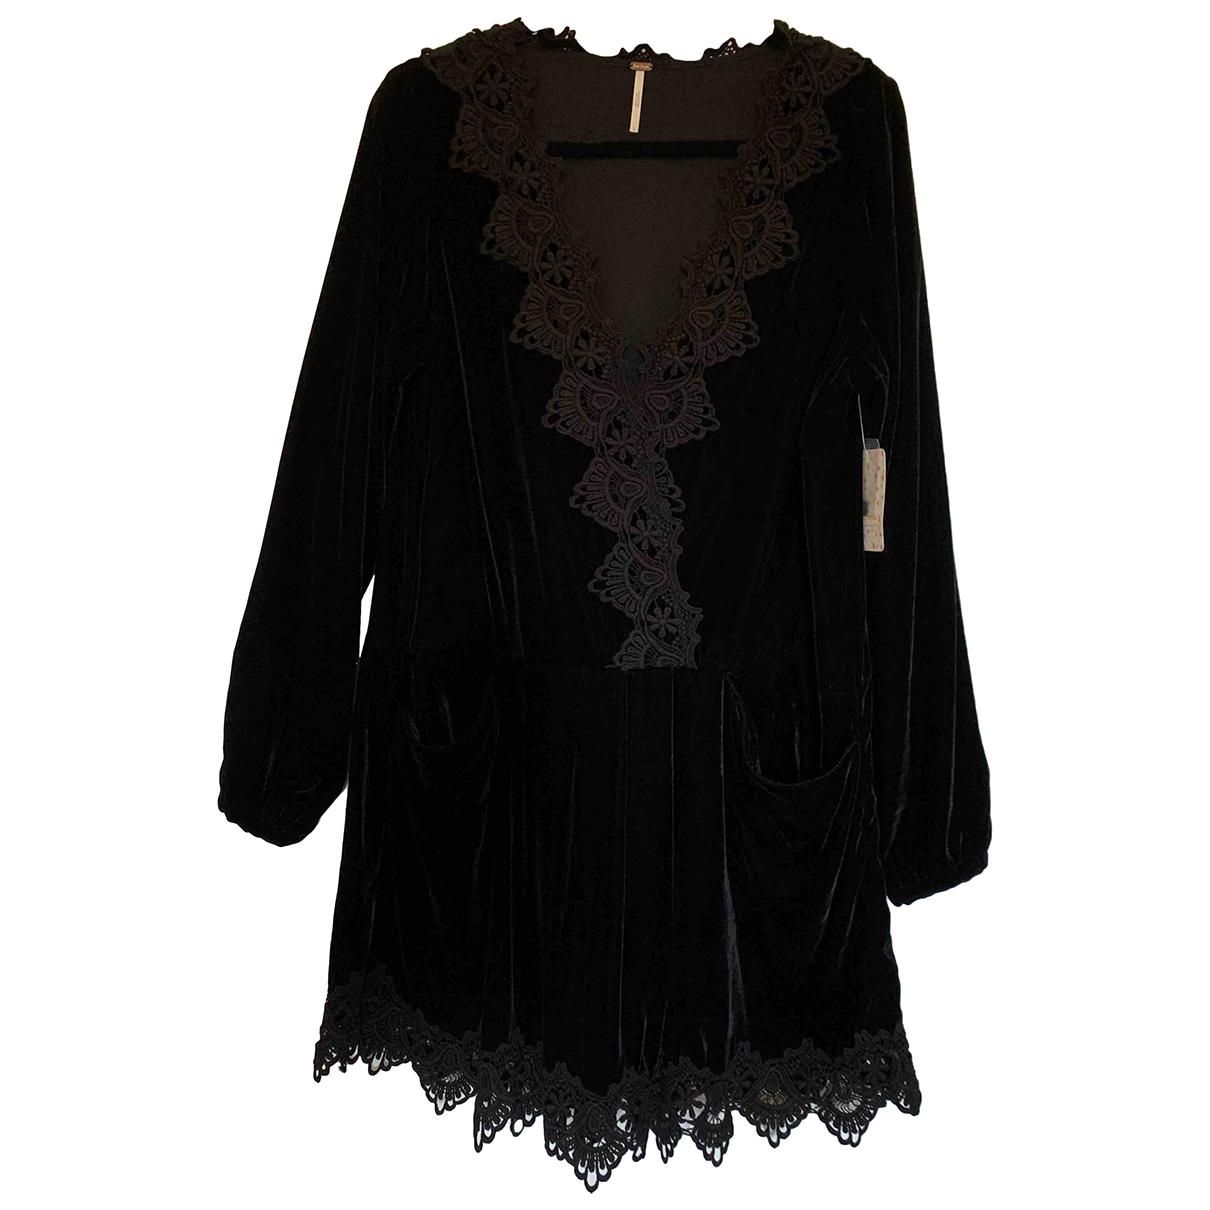 Free People - Robe   pour femme en velours - noir